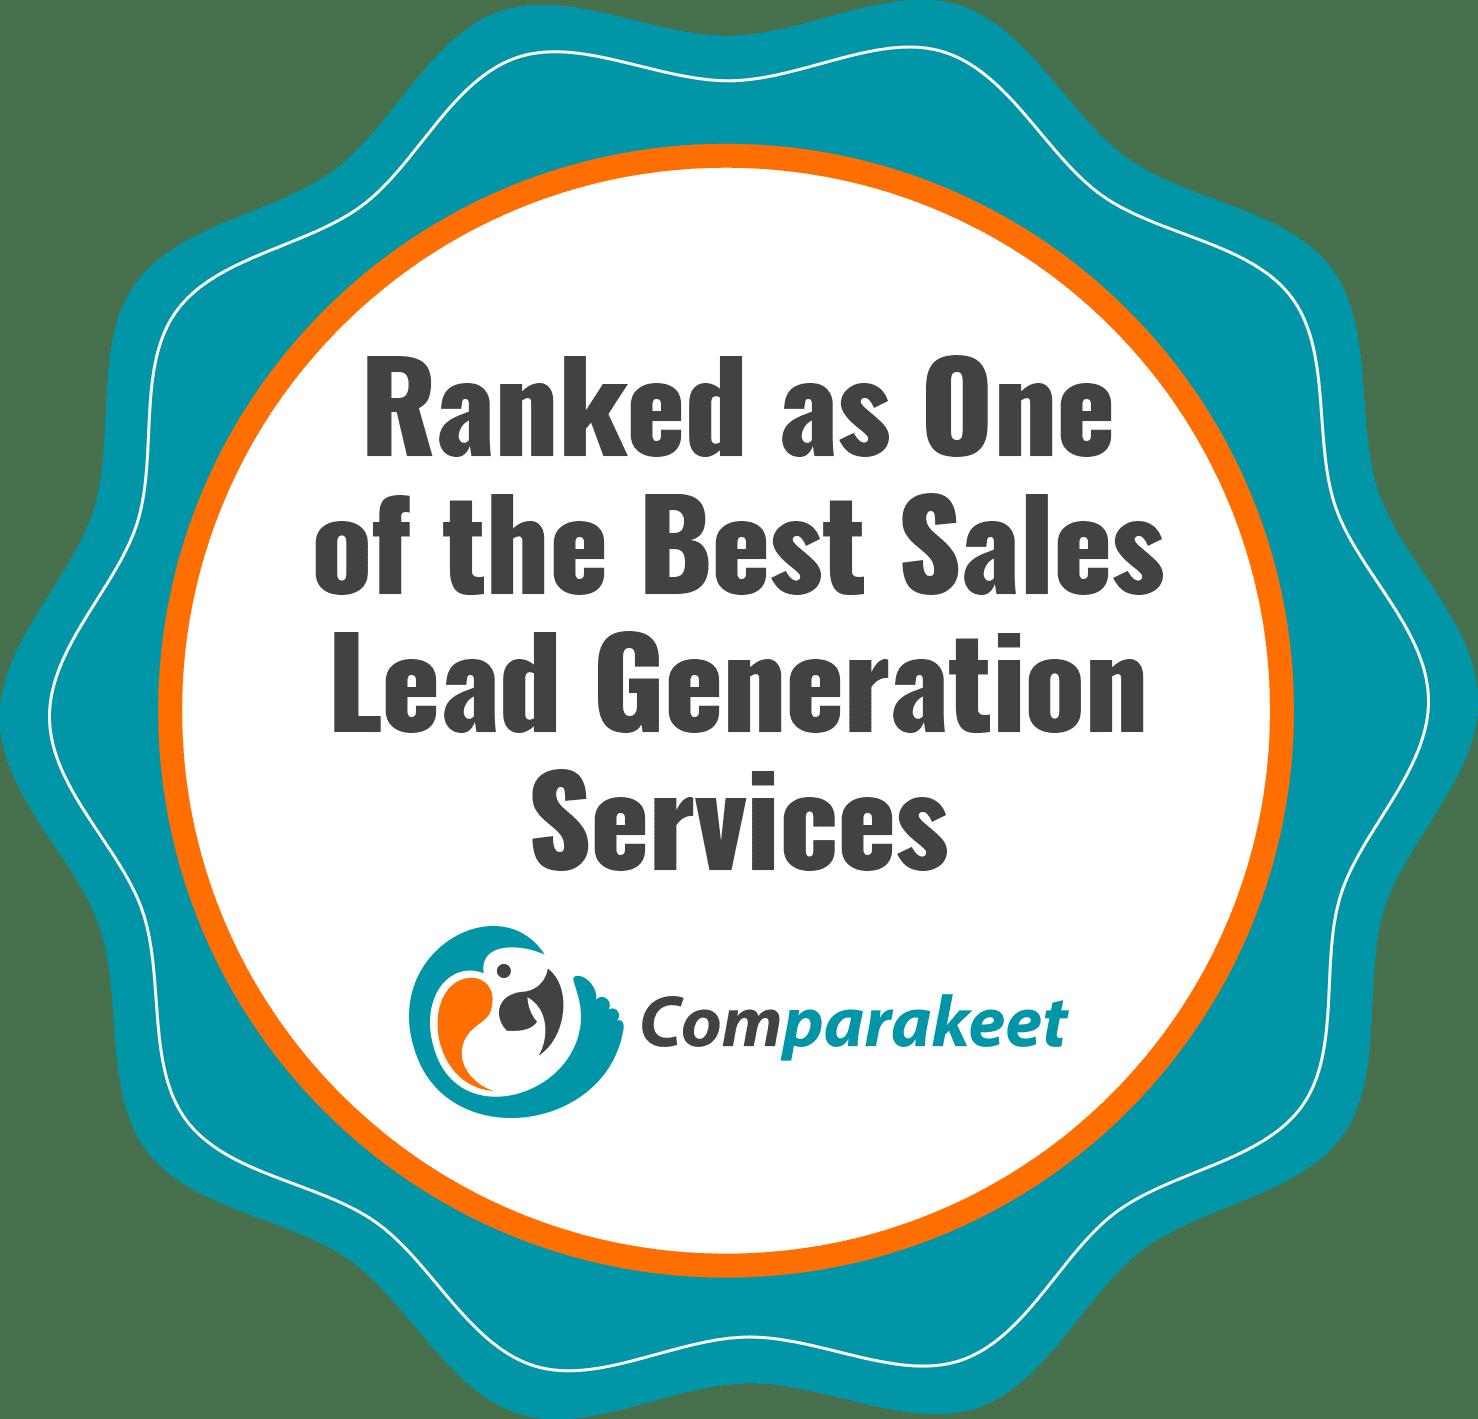 Best Sales Lead Generation Services Comparakeet